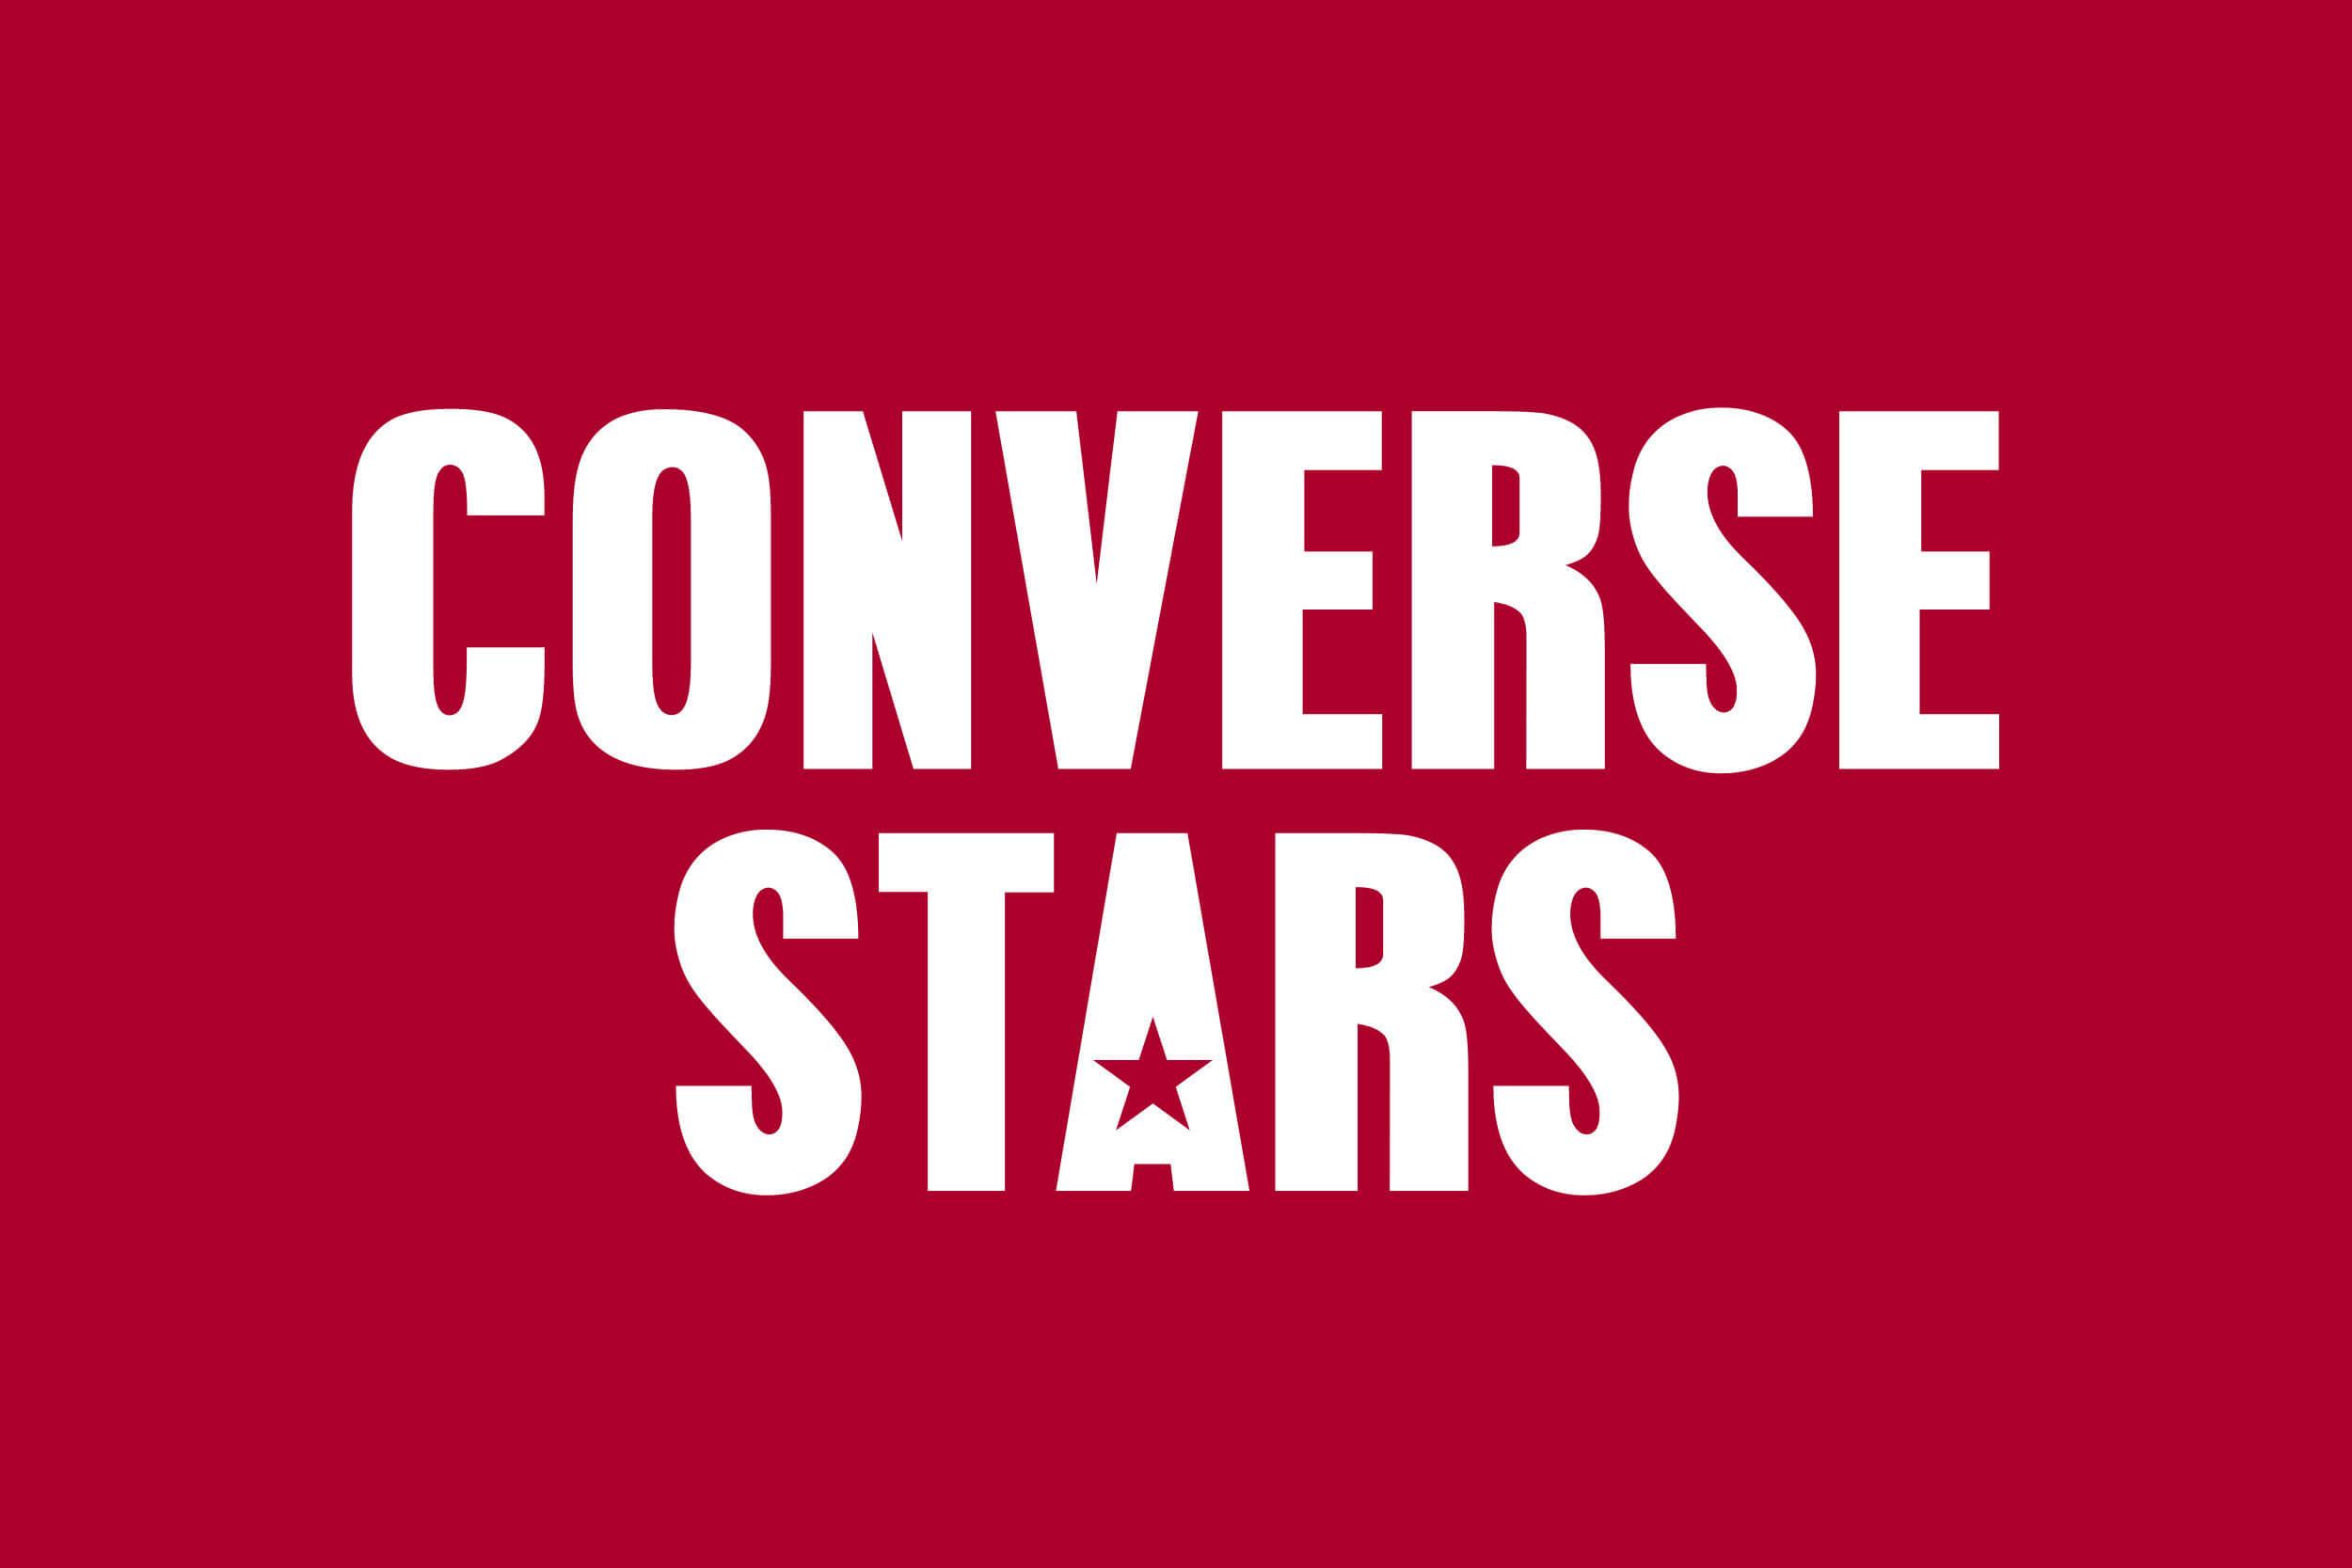 【CONVERSE STARS(コンバーススターズ)】@ルミネエスト新宿のカバー写真